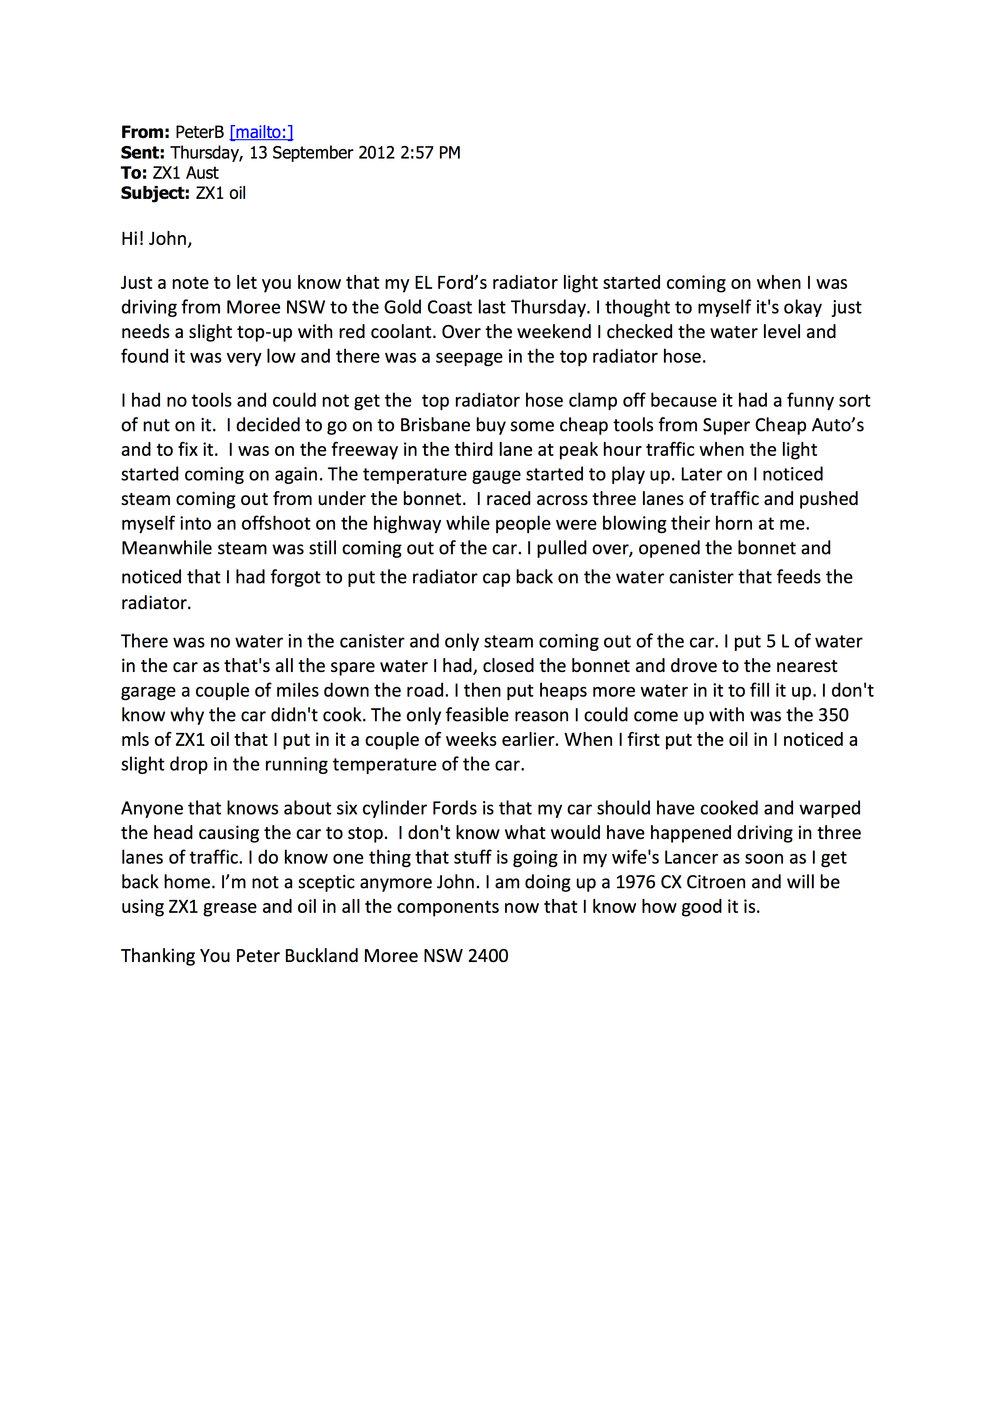 Peter Buckland Testimony.jpg